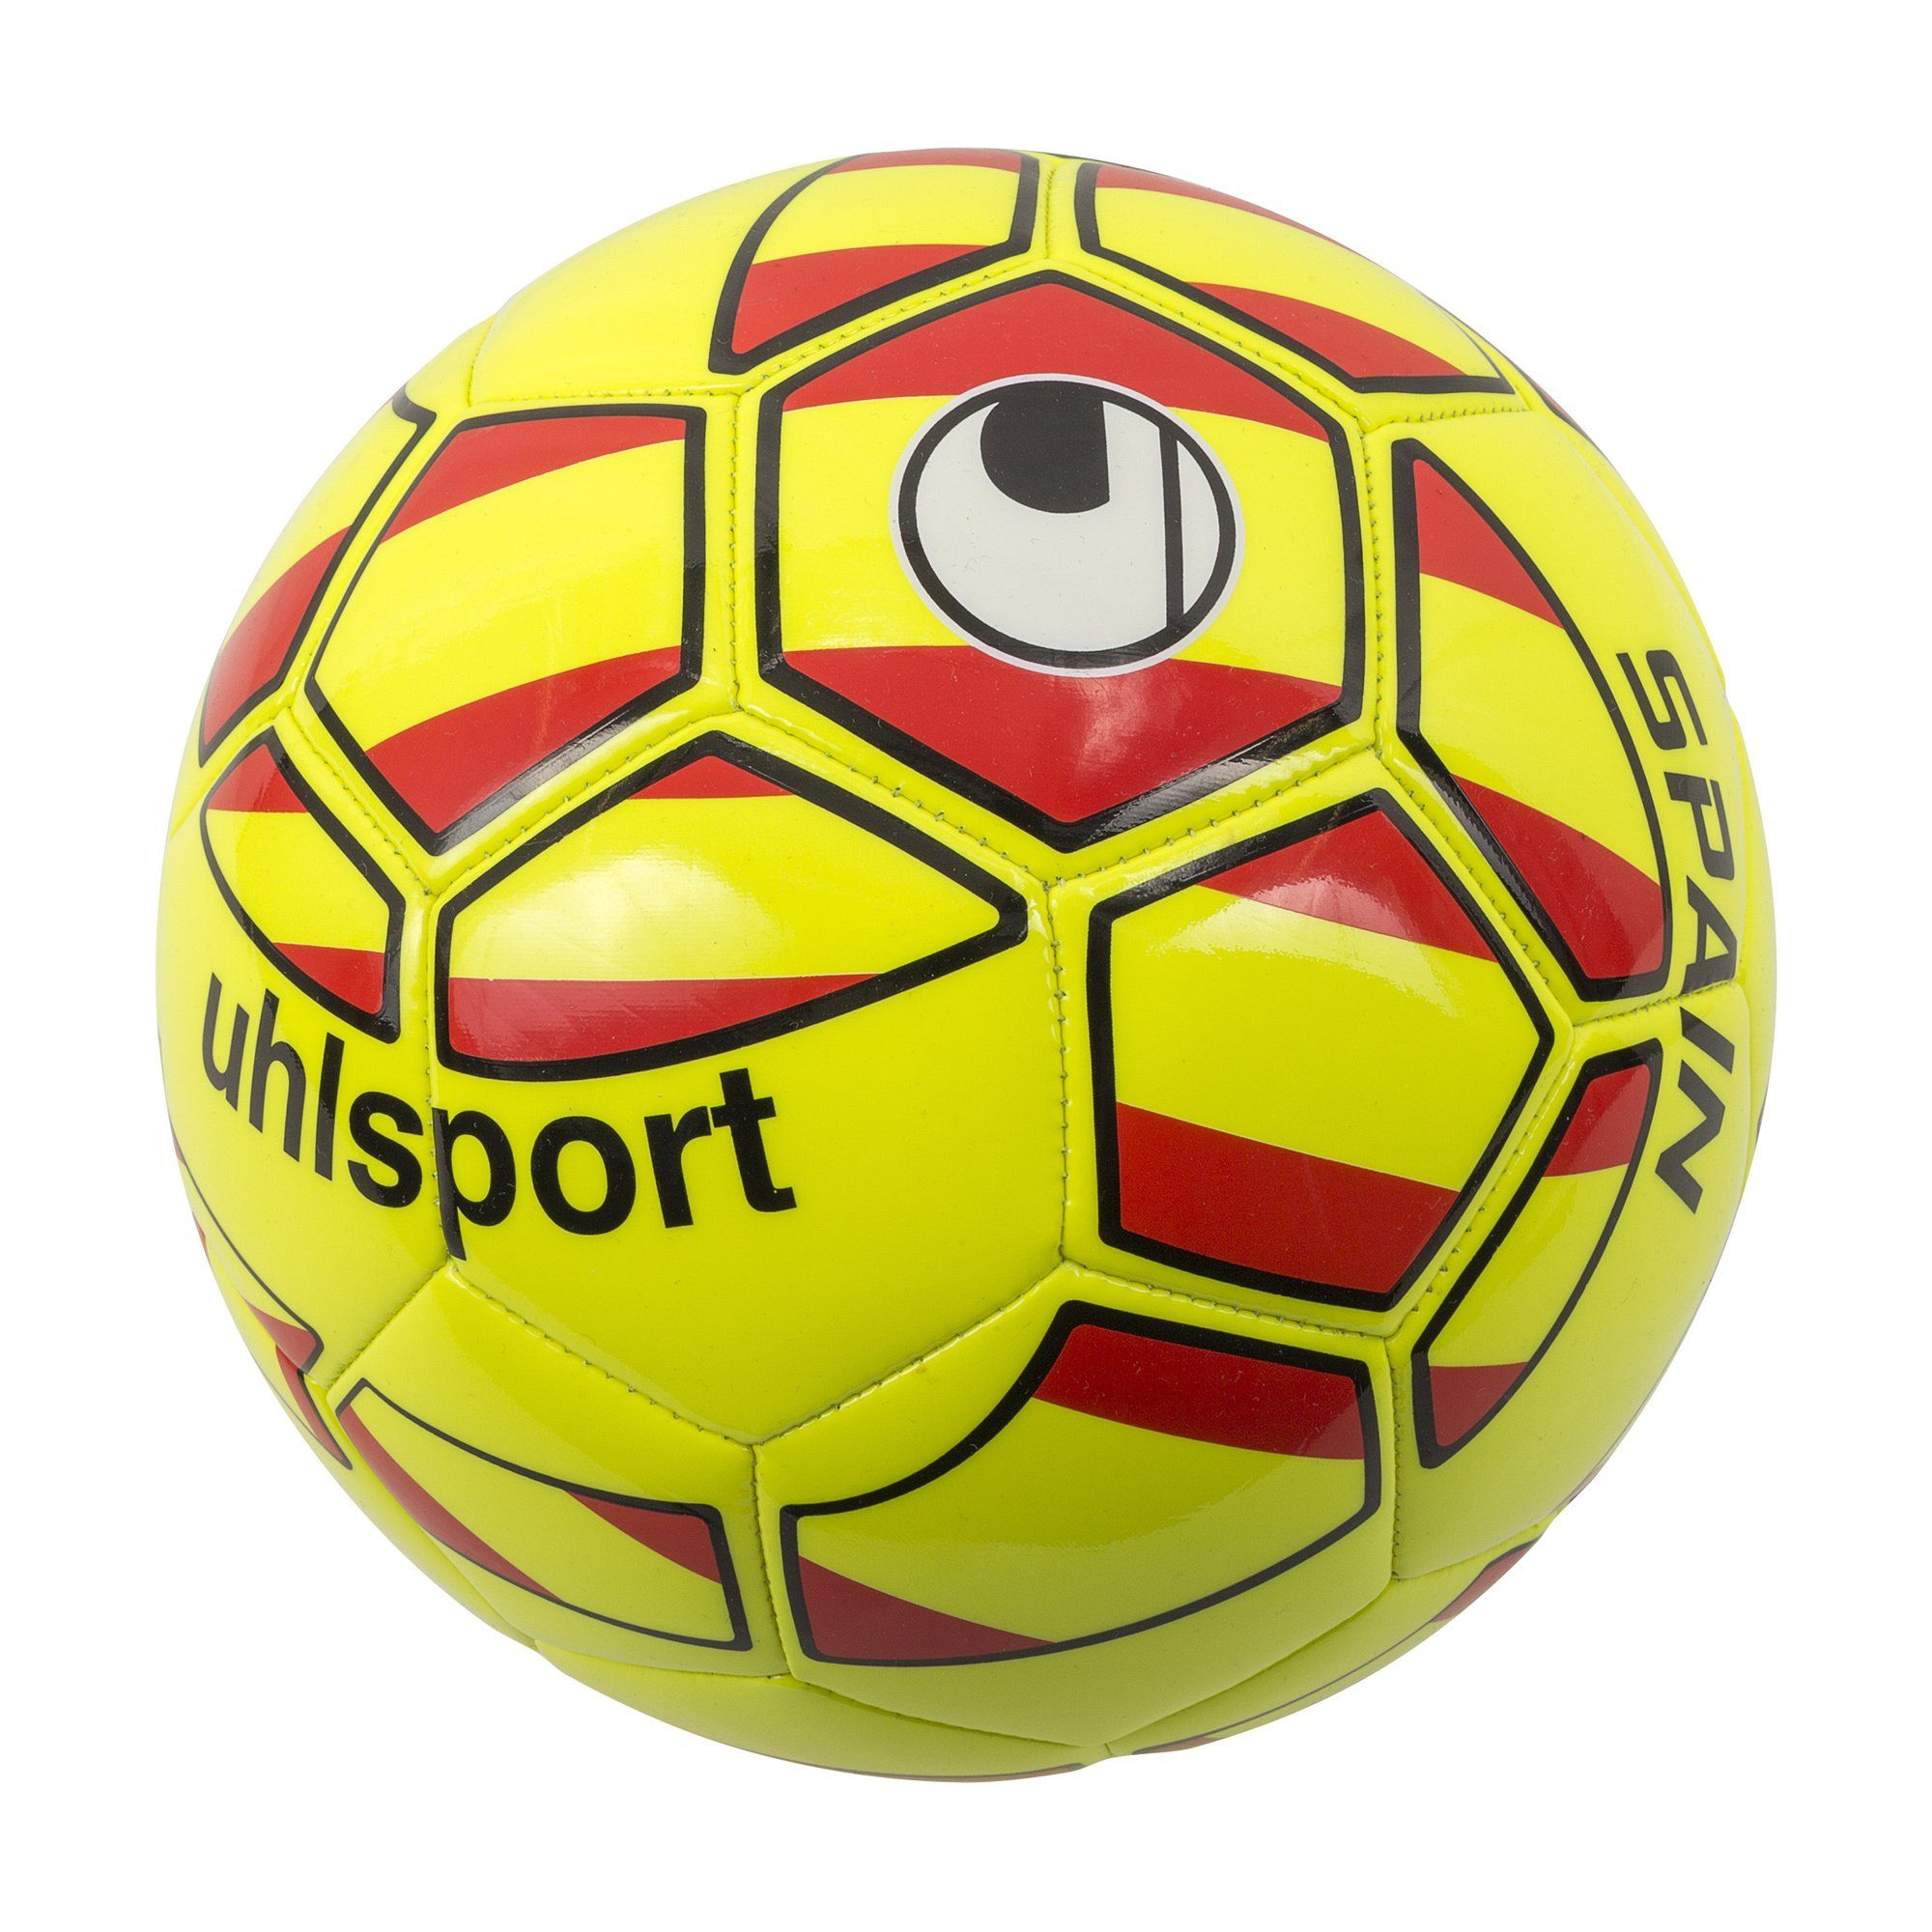 UHLSPORT Spanien Mini Fußball